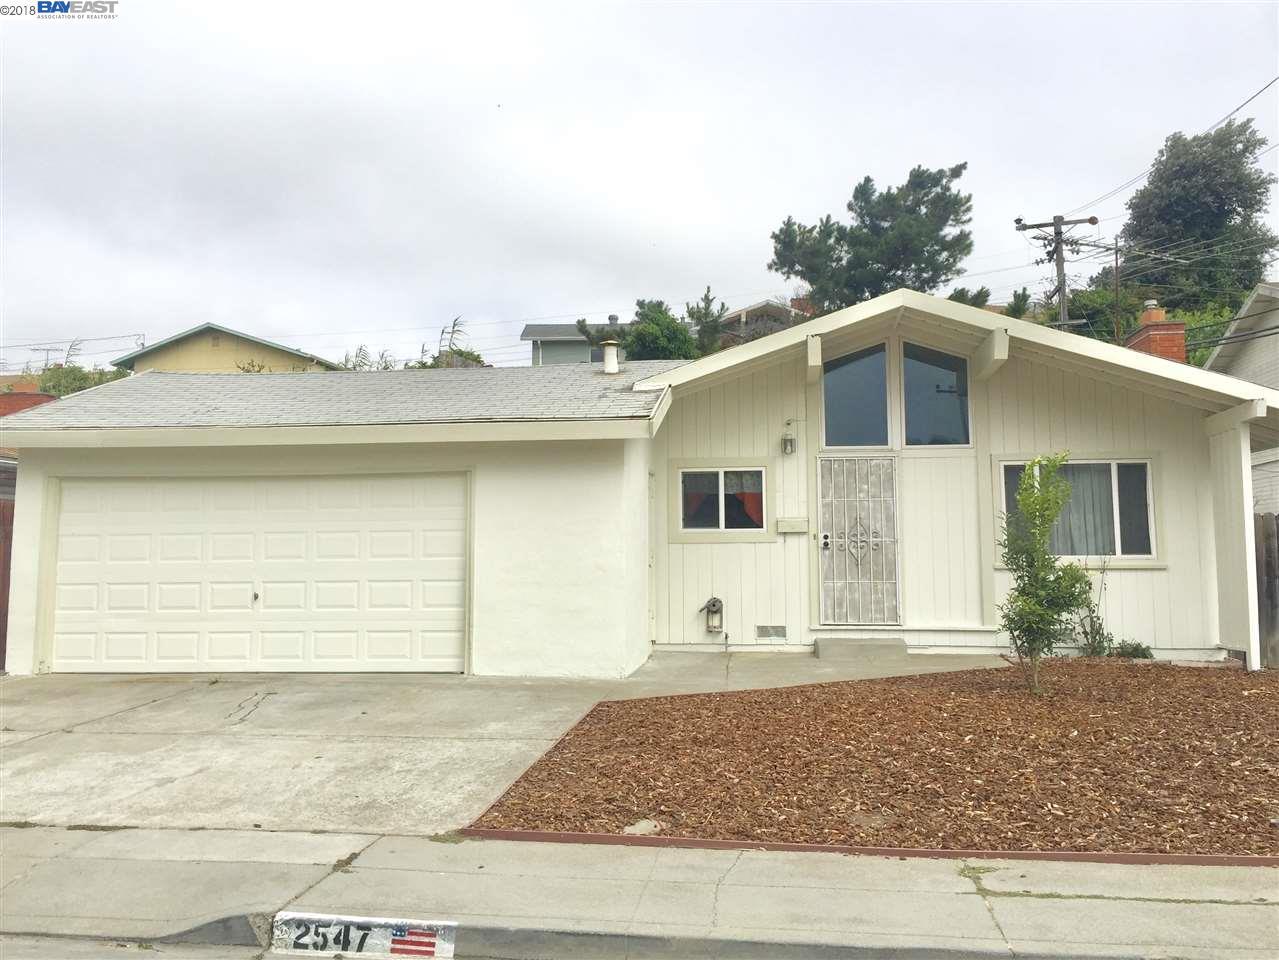 2547 MOYERS RD, RICHMOND, CA 94806